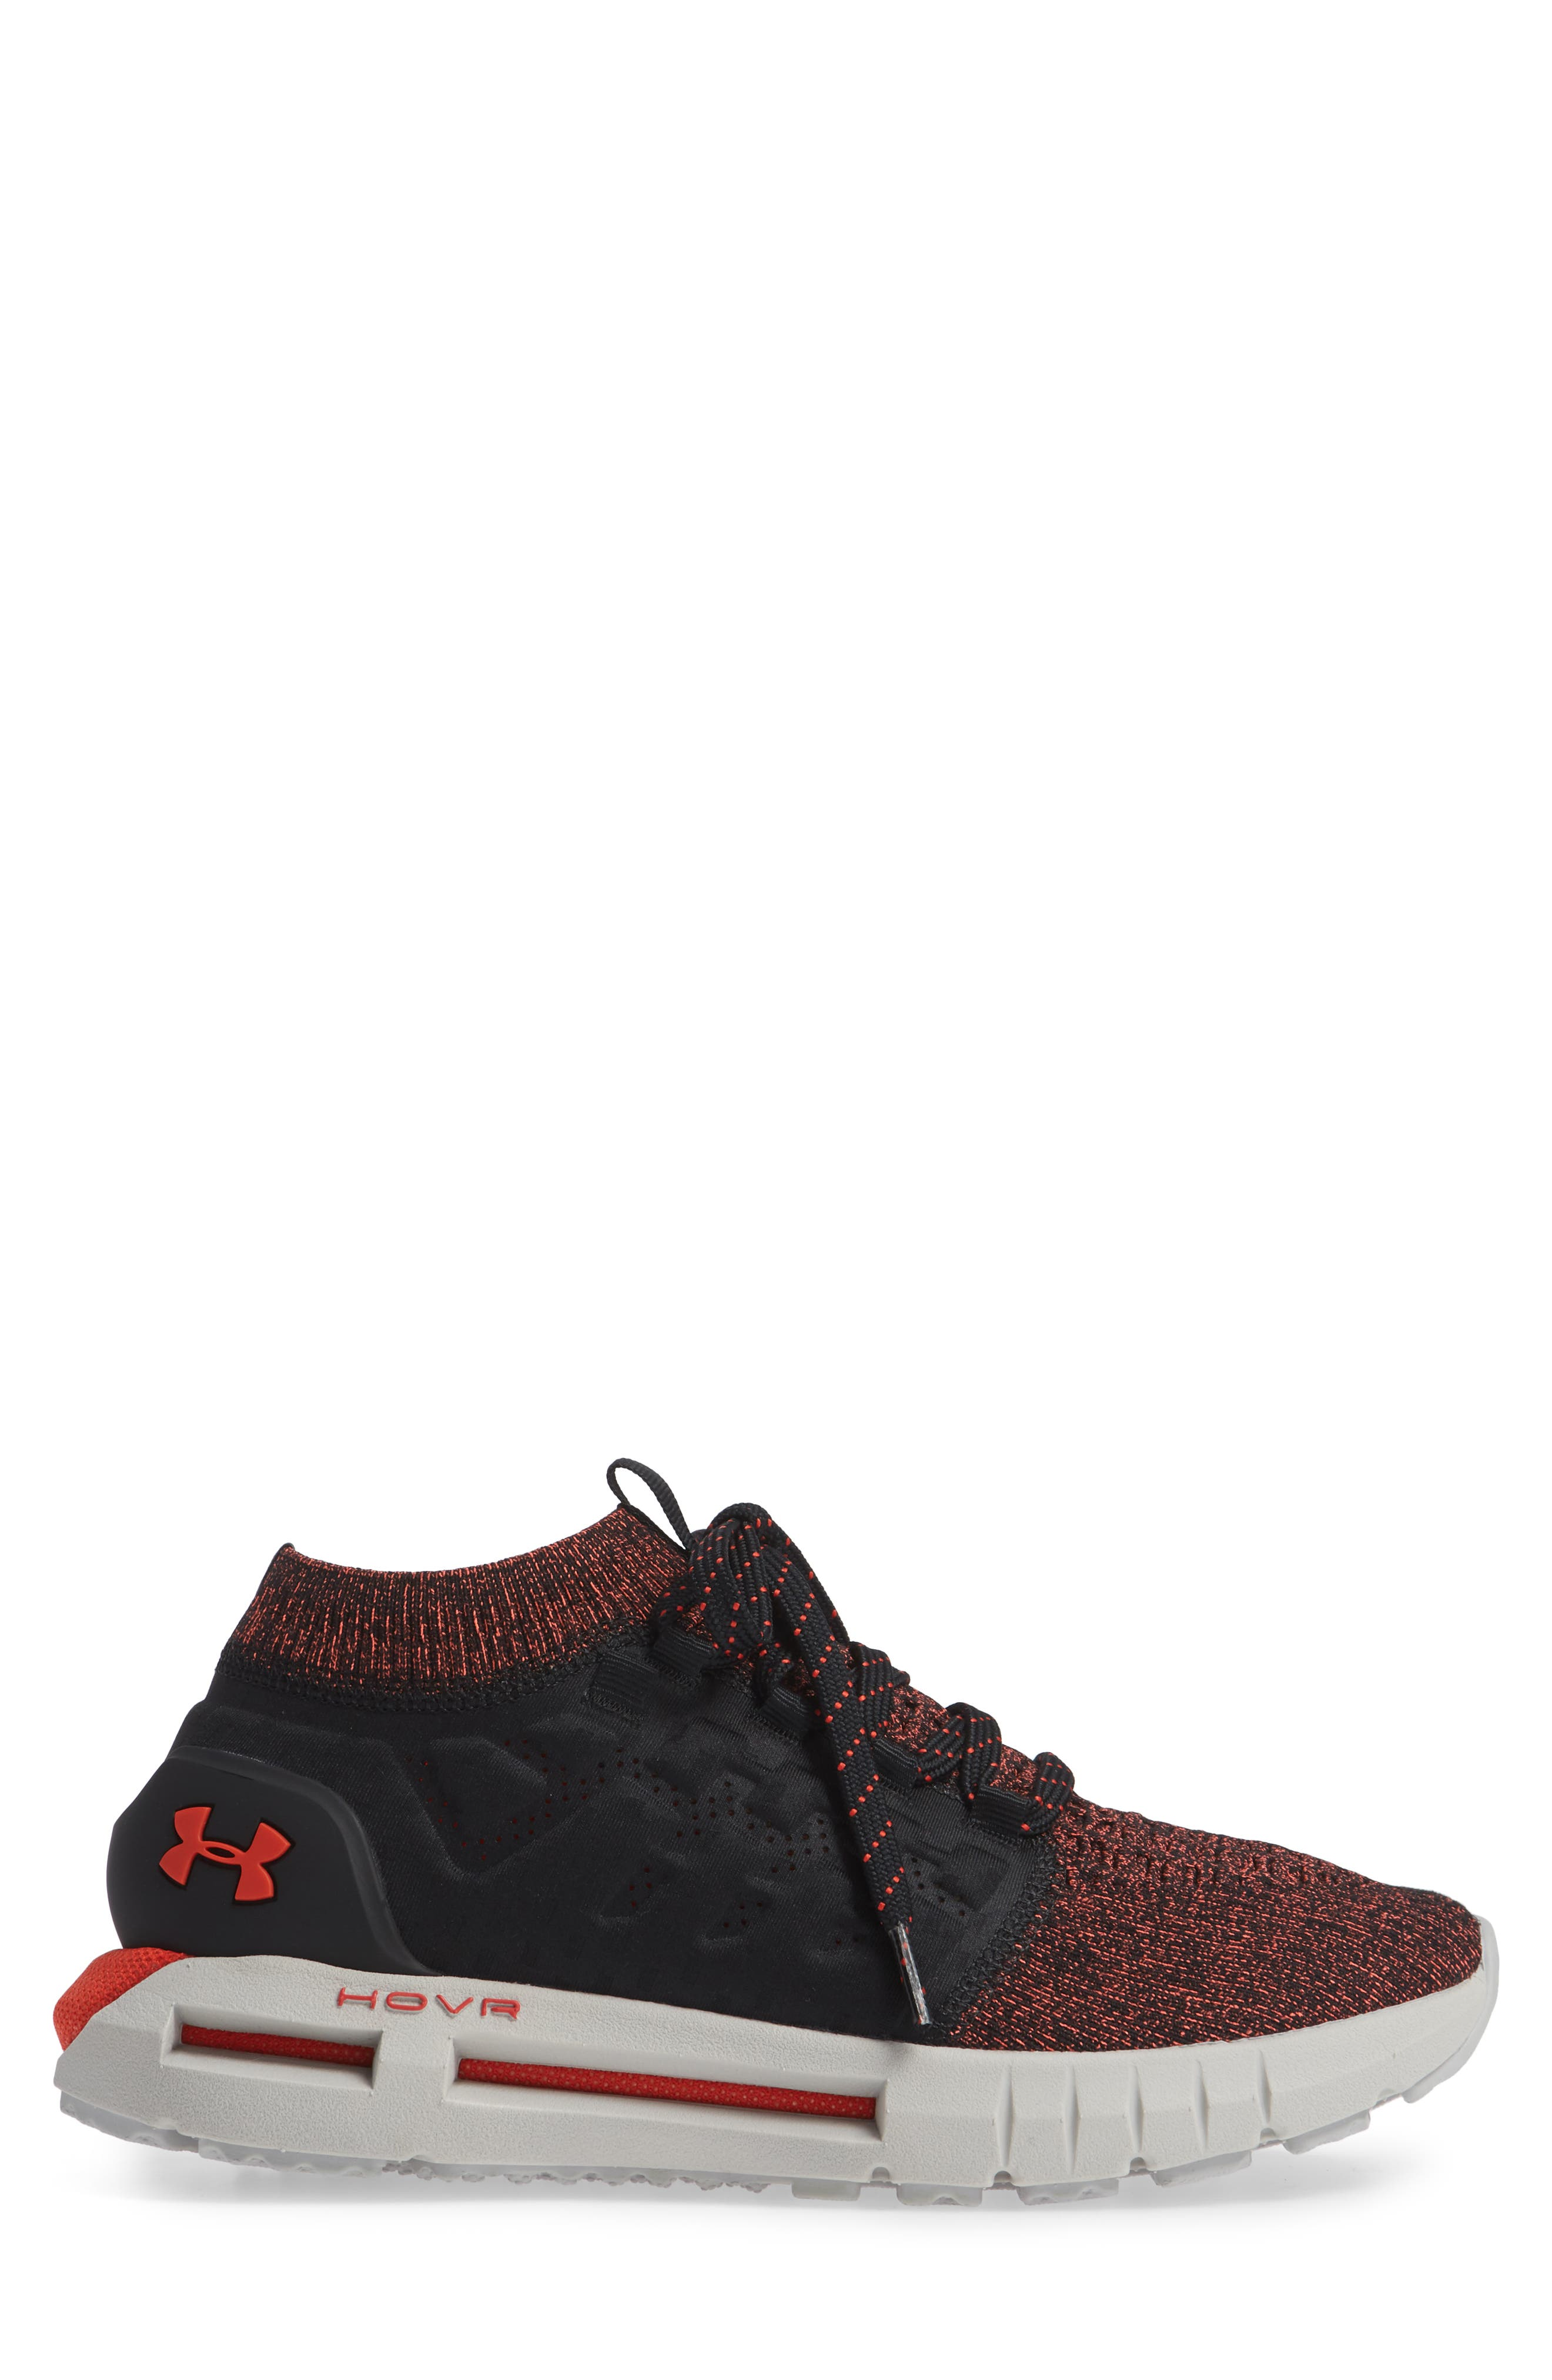 HOVR Phantom NC Sneaker,                             Alternate thumbnail 4, color,                             Black/ Ghost Grey/ Radio Red